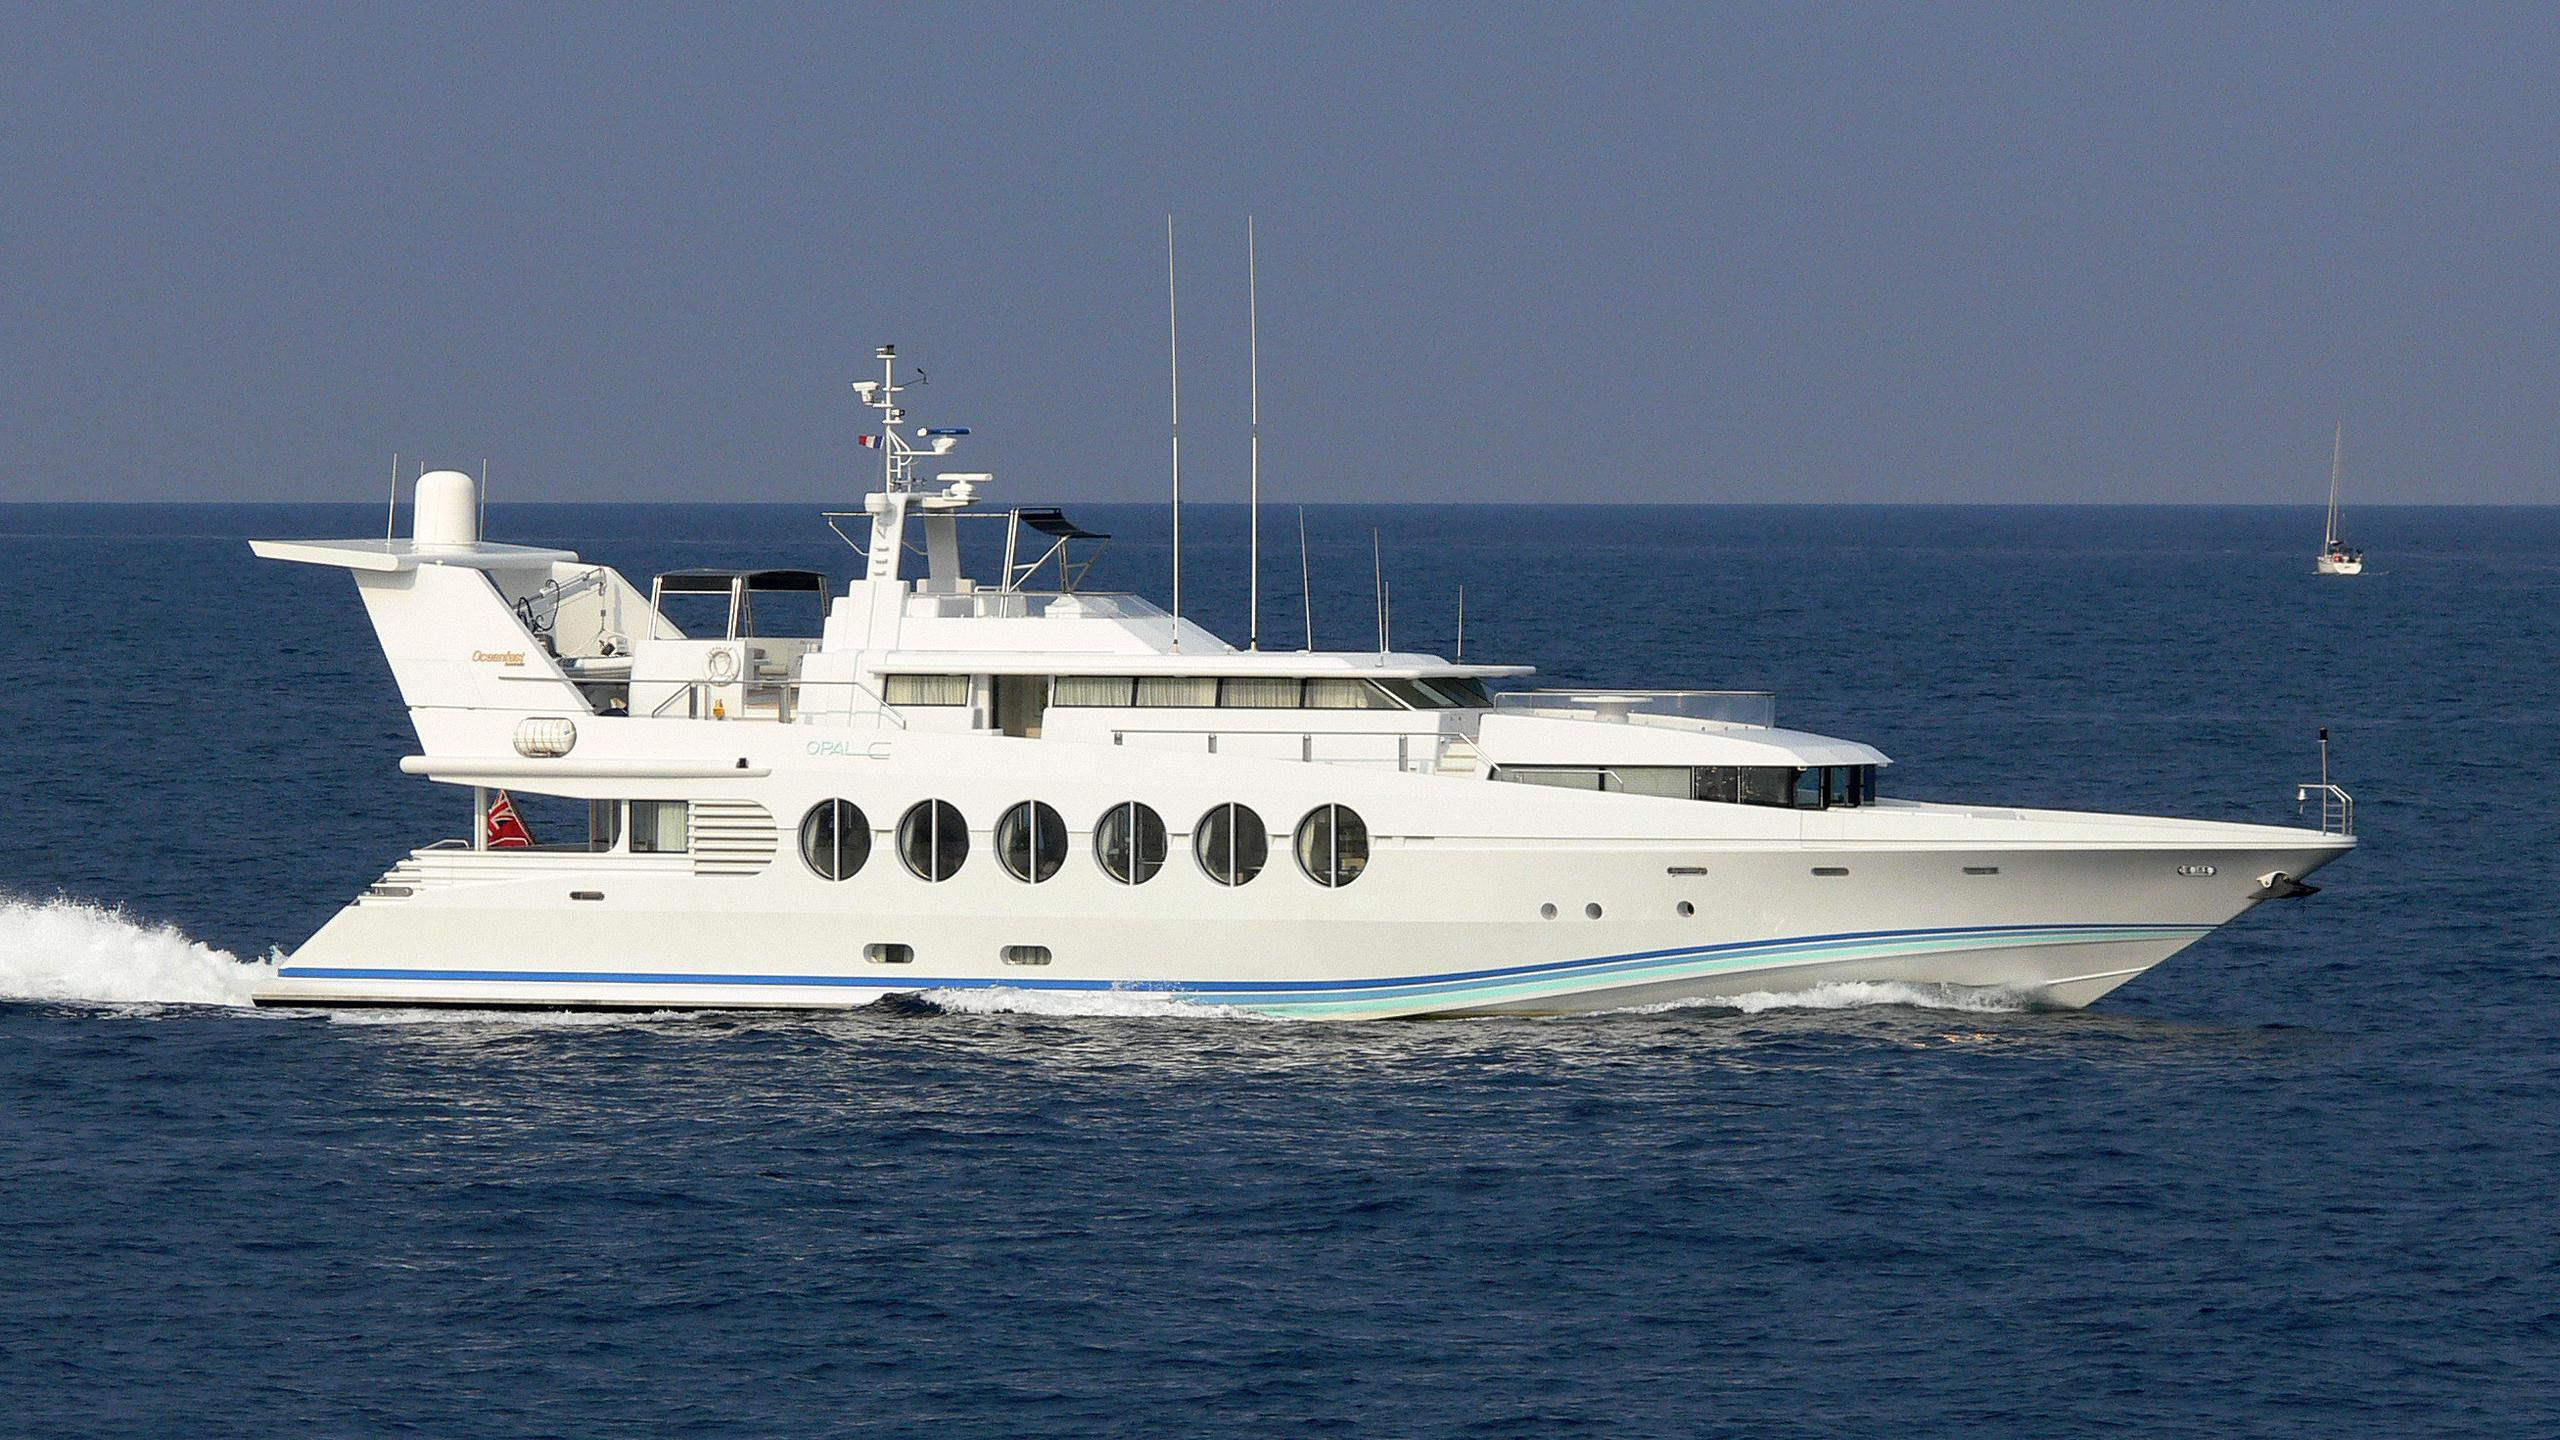 lady-arraya-motor-yacht-oceanfast-1990-40m-cruising-profile